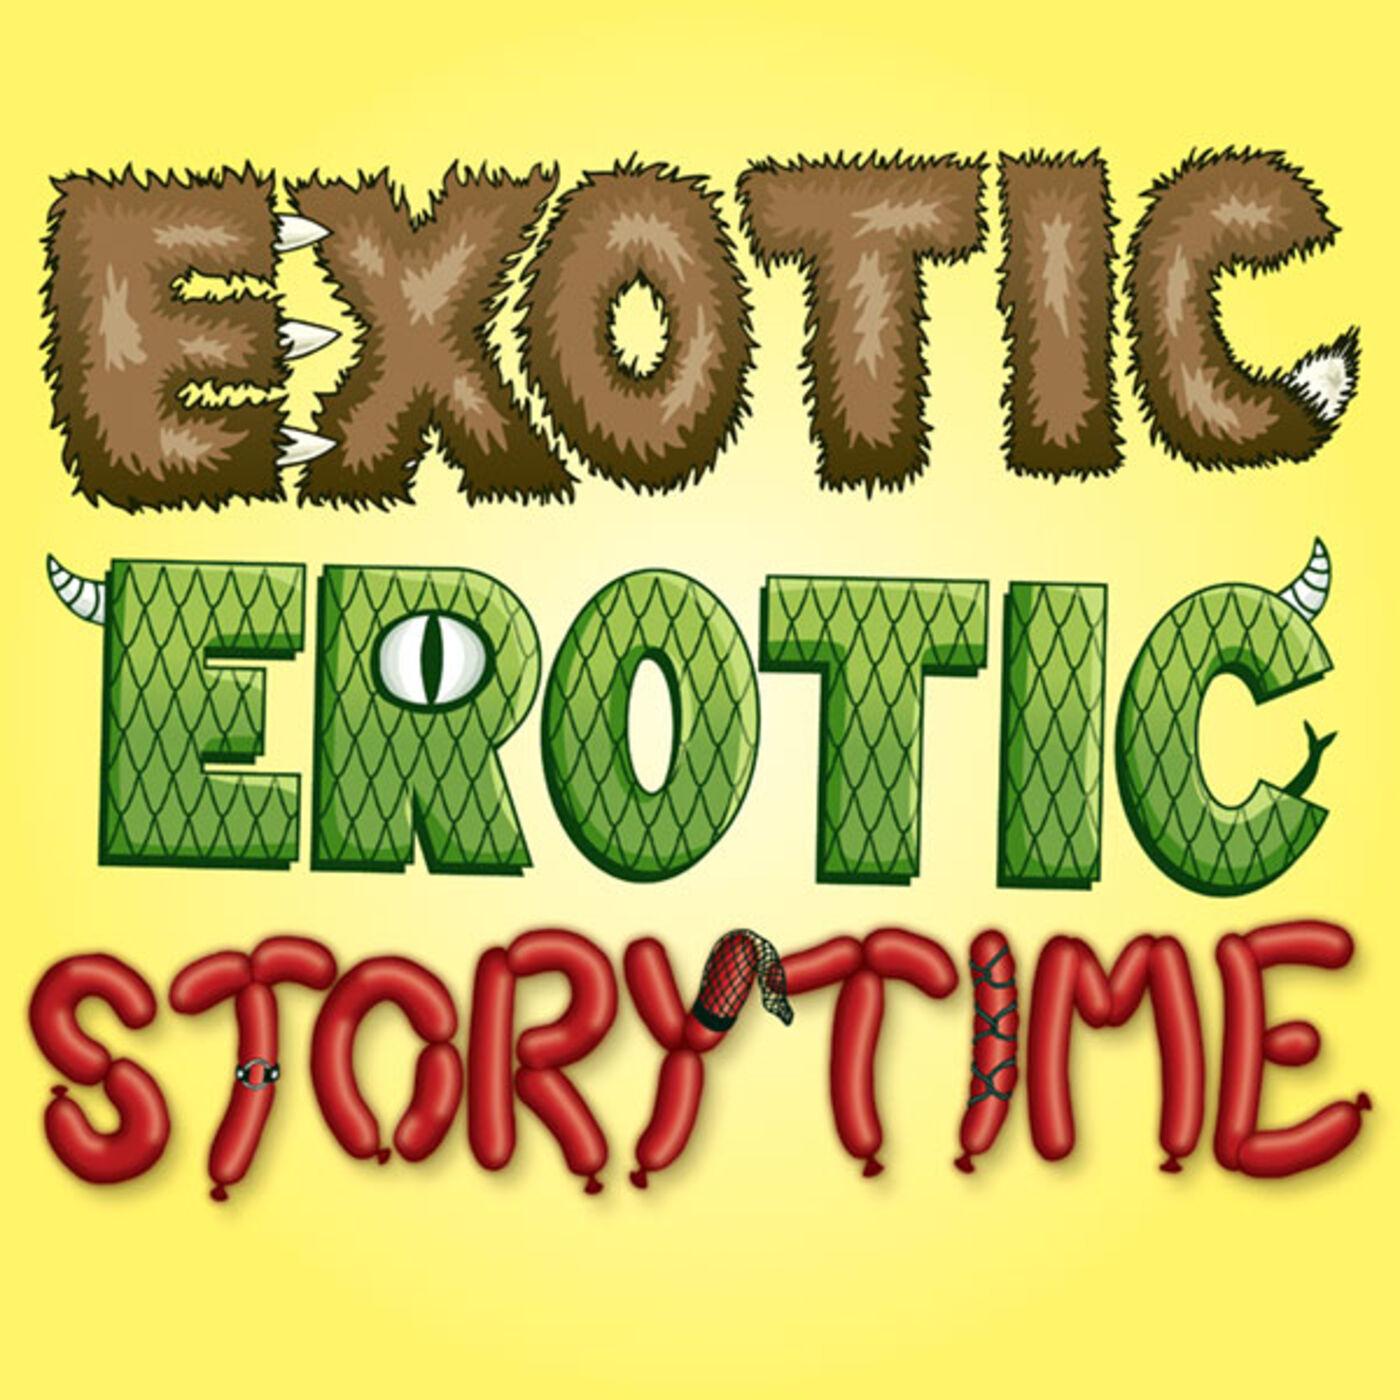 Exotic Erotic Storytime